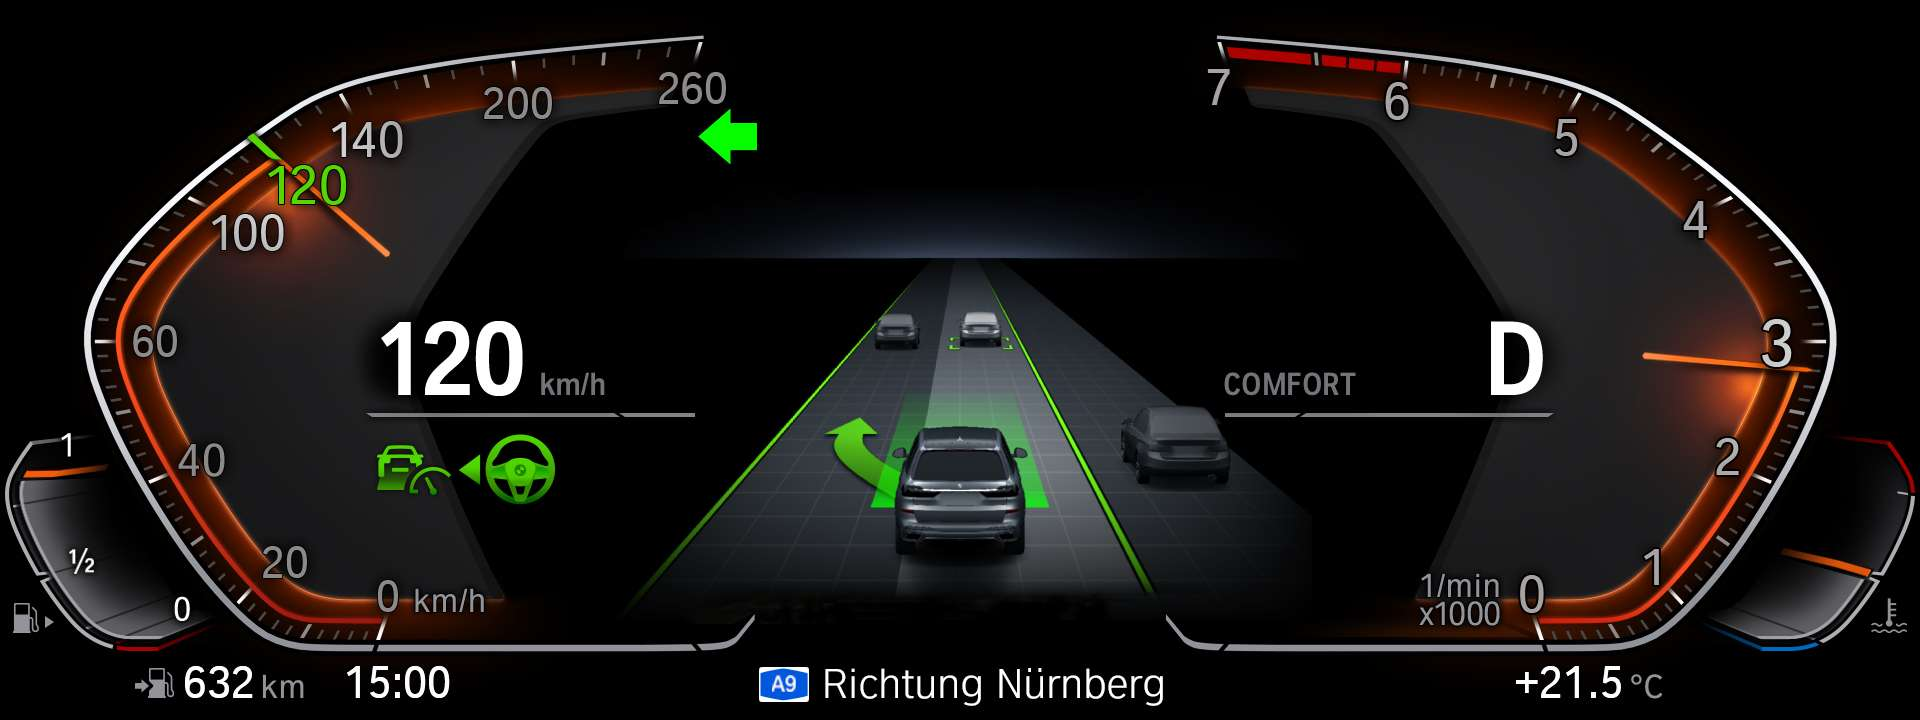 BMW自动驾驶辅助系统在2020 Euro NCAP测评中获得最高评级